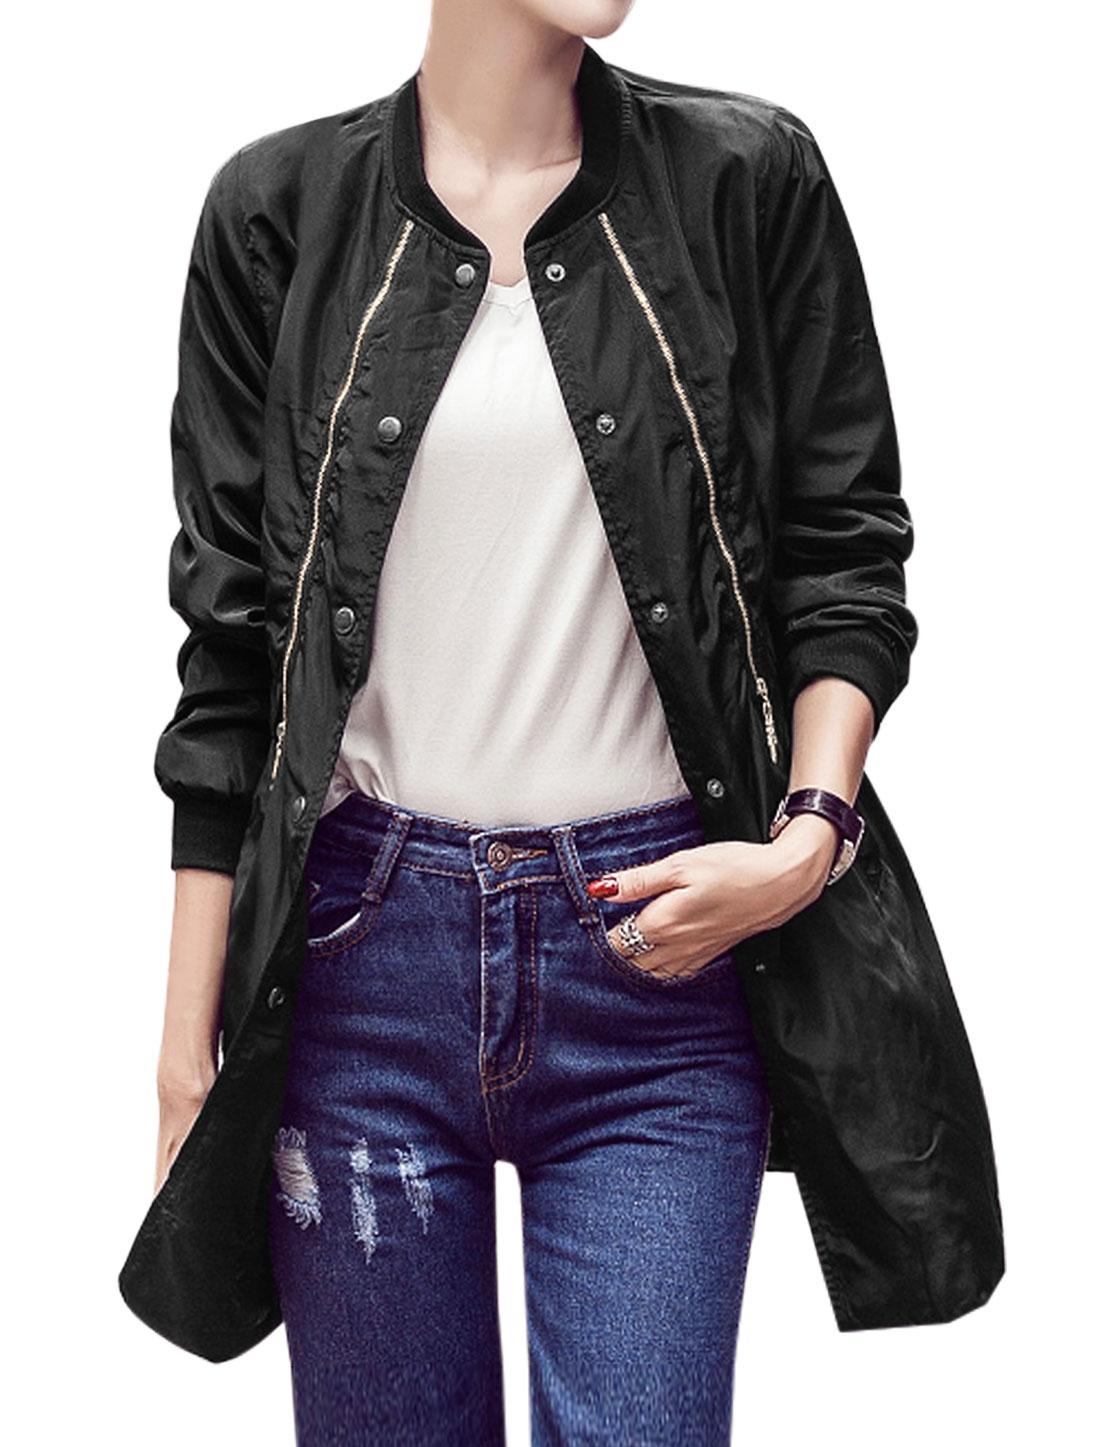 Women-Stand-Collar-Double-Zipper-Decor-Overlay-Elastic-Tunic-Jacket